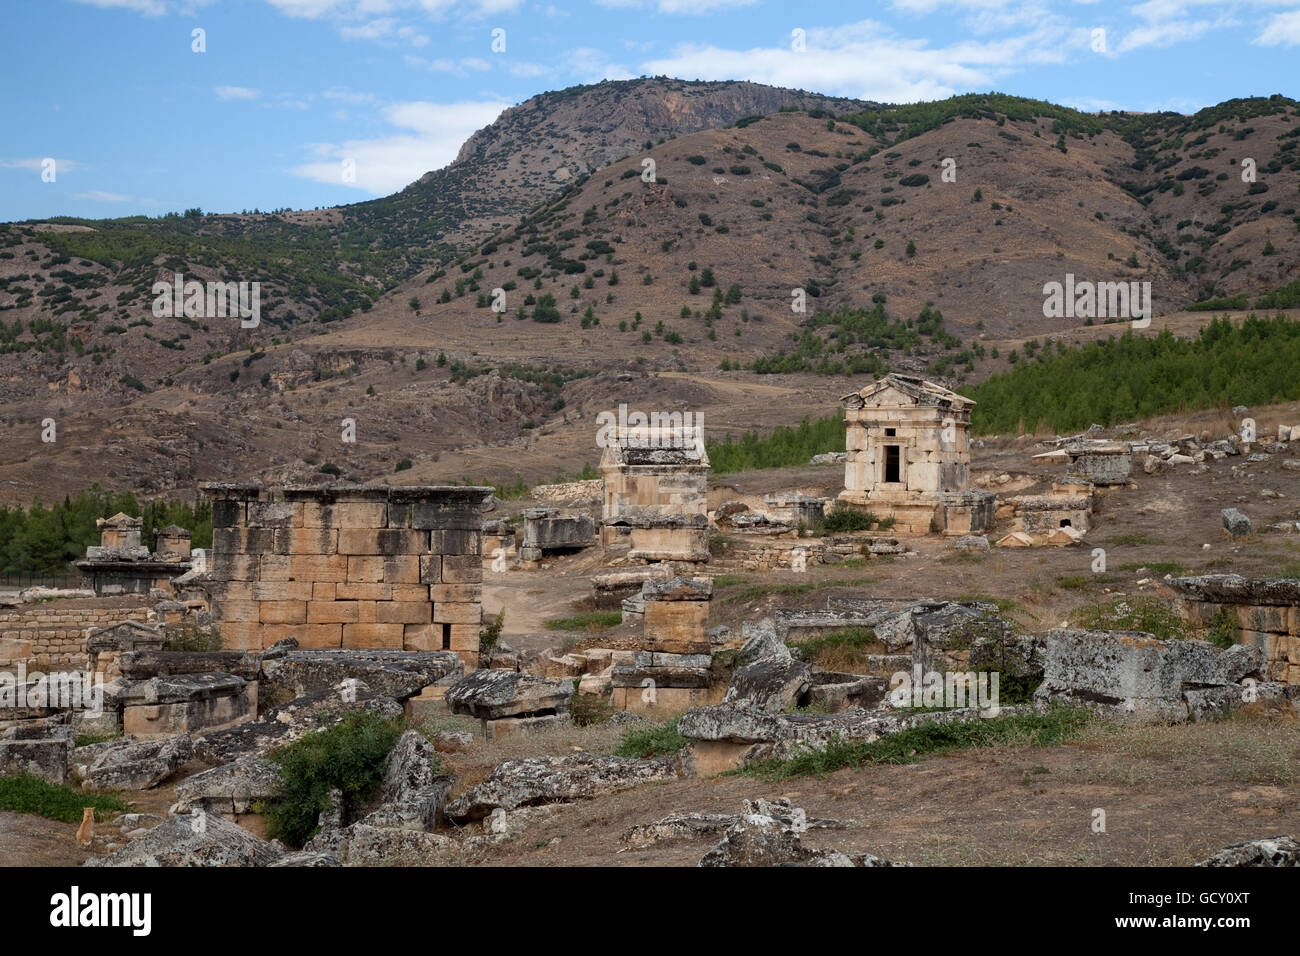 Burying place, Hierapolis, Pamukkale, Denizli, Turkey, Asia - Stock Image